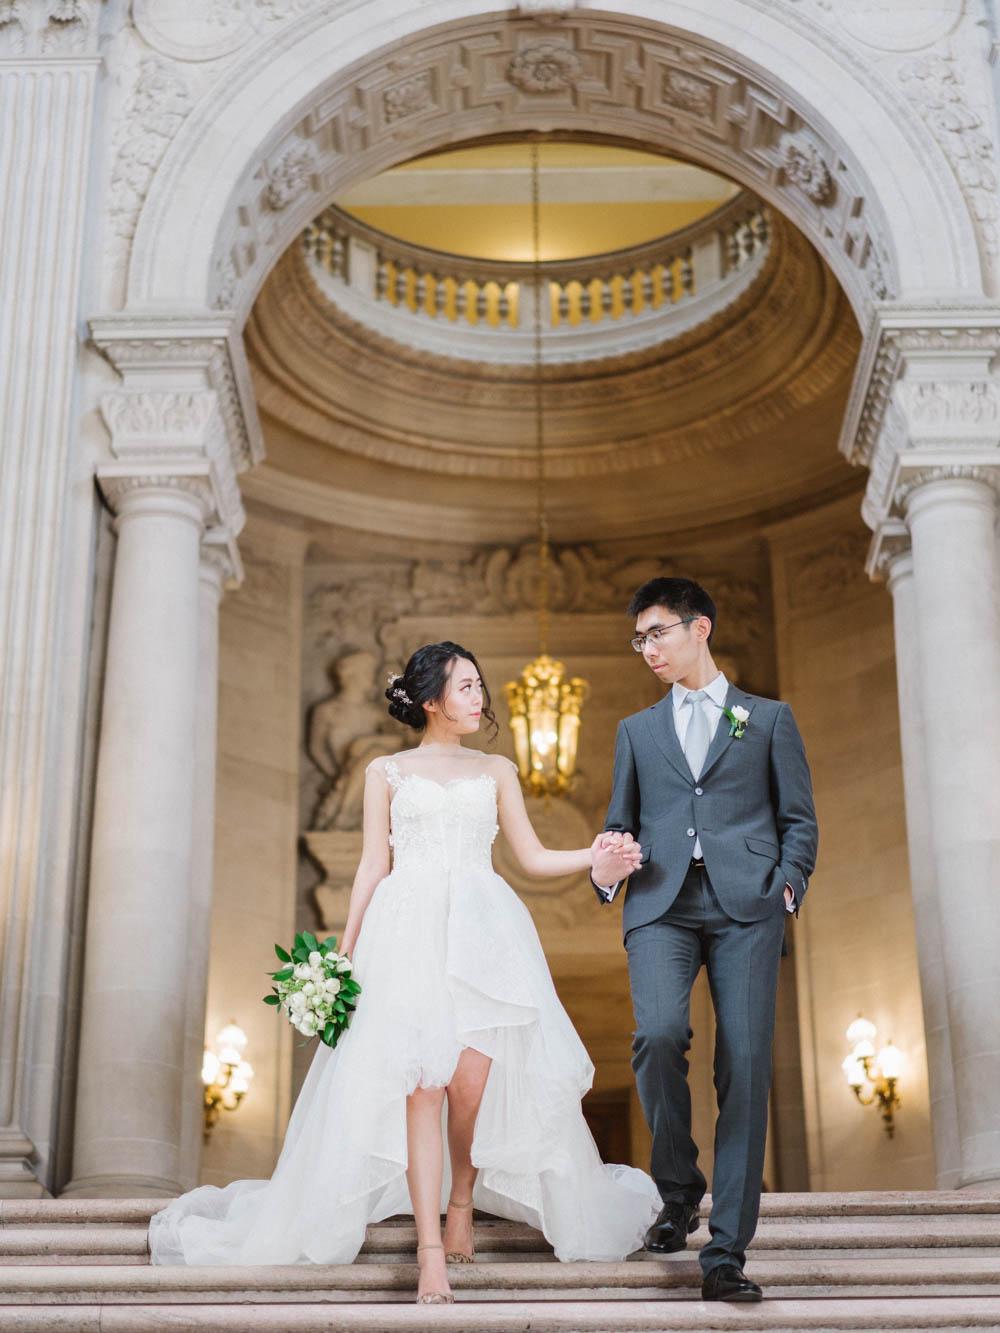 San Francisco Wedding Photographer - City Hall - Pinnel Photography-03164.jpg